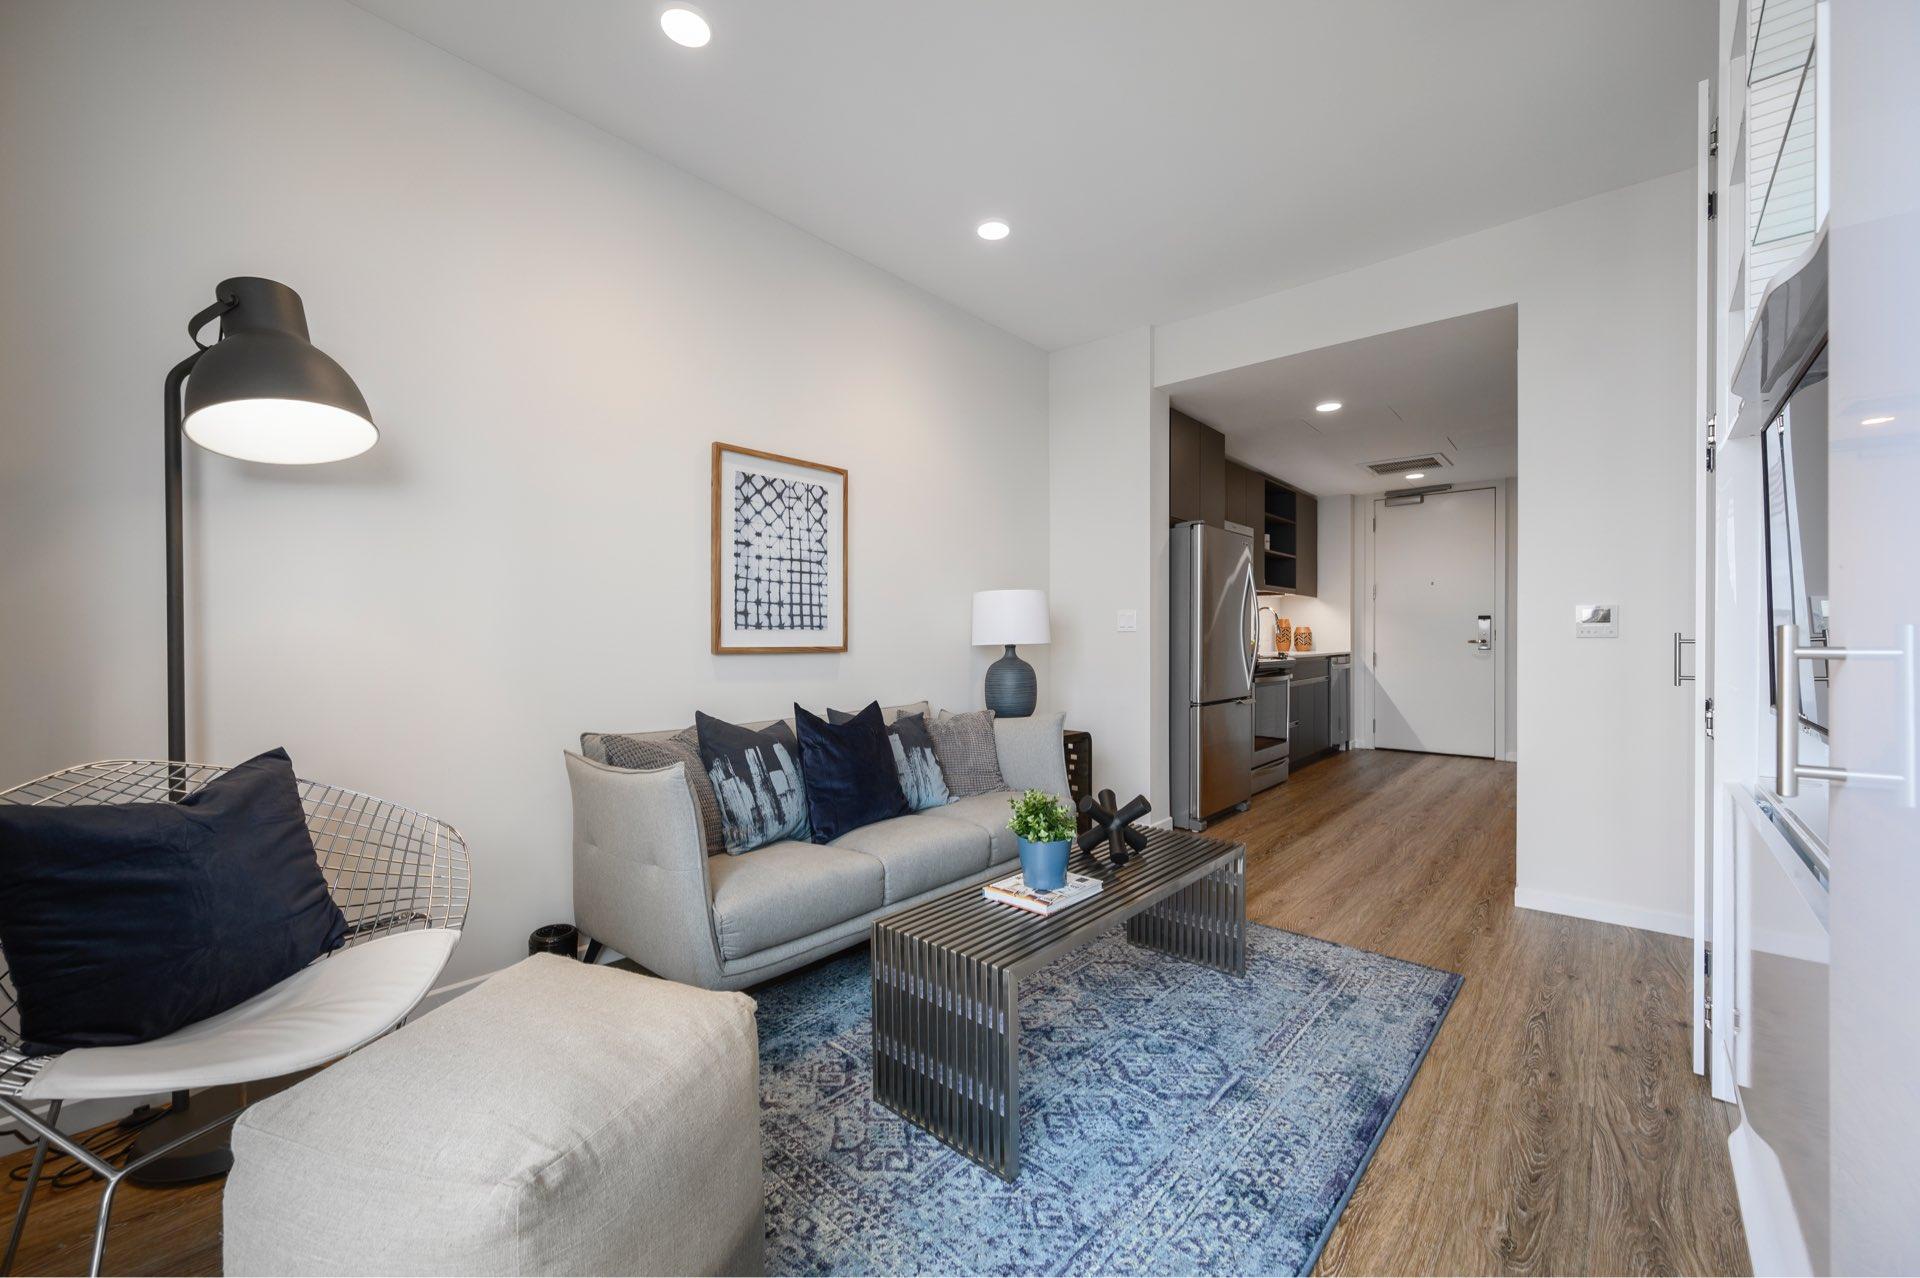 Apartments img 21